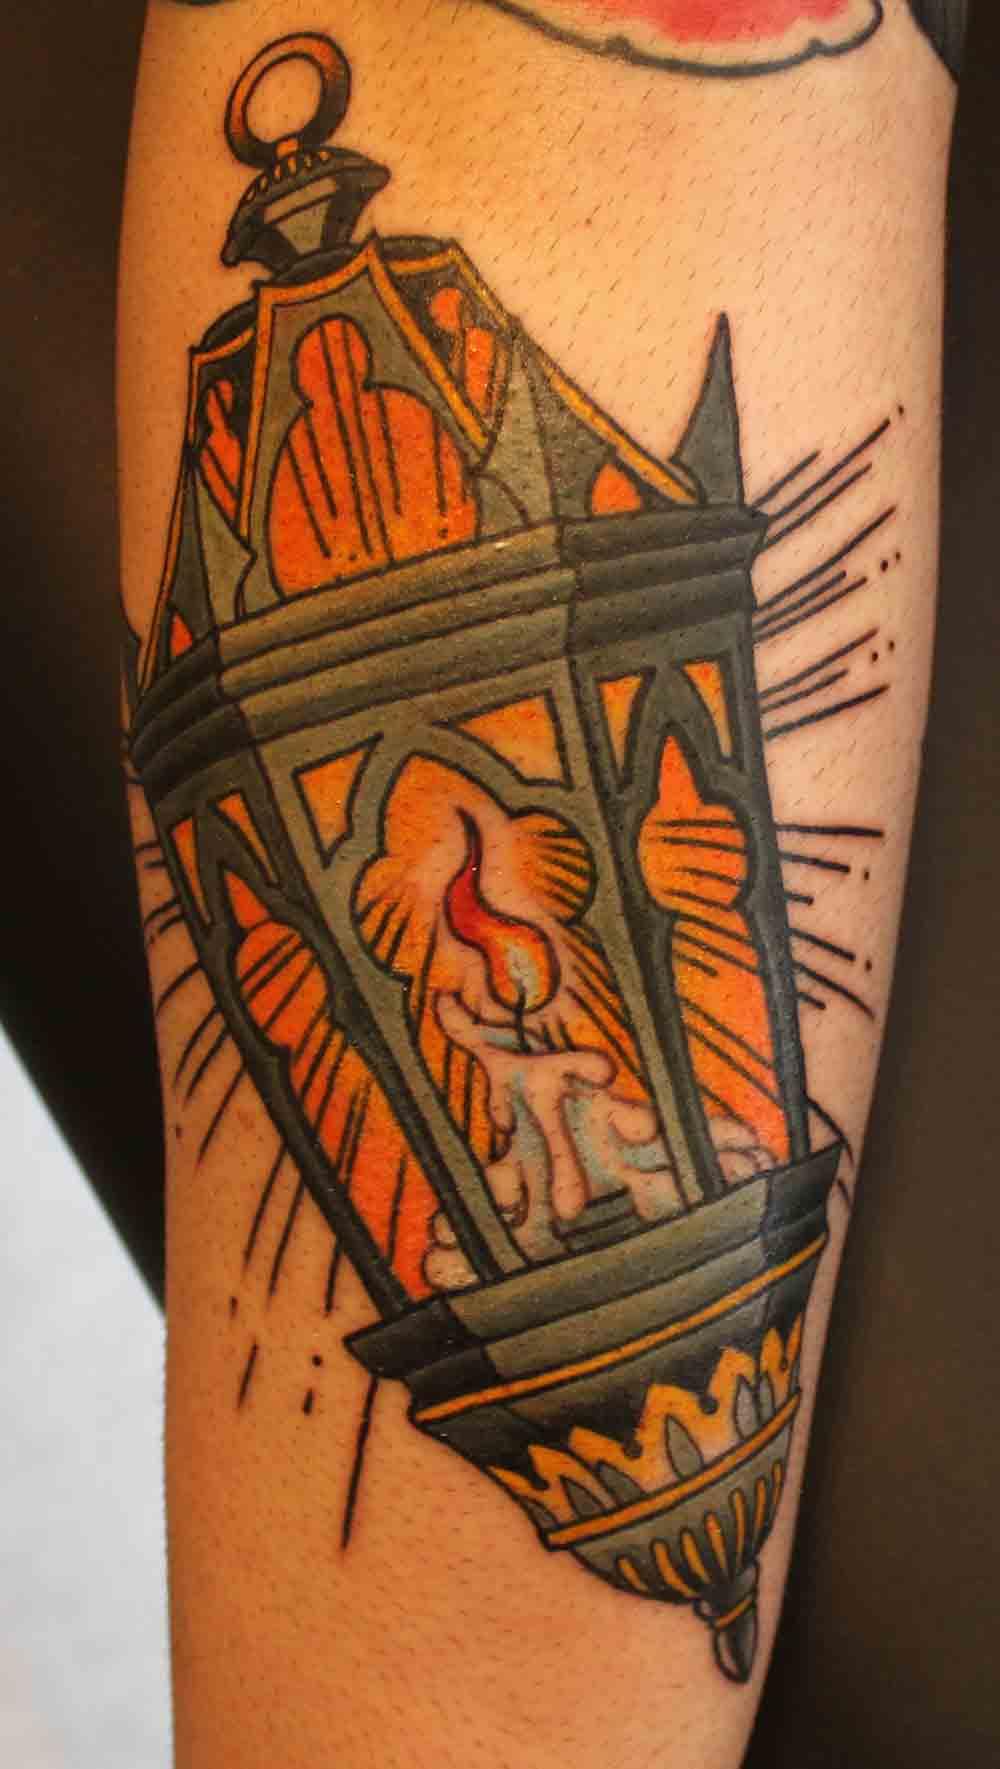 Lamp Colored Tattoo Custom Tattoos In New York